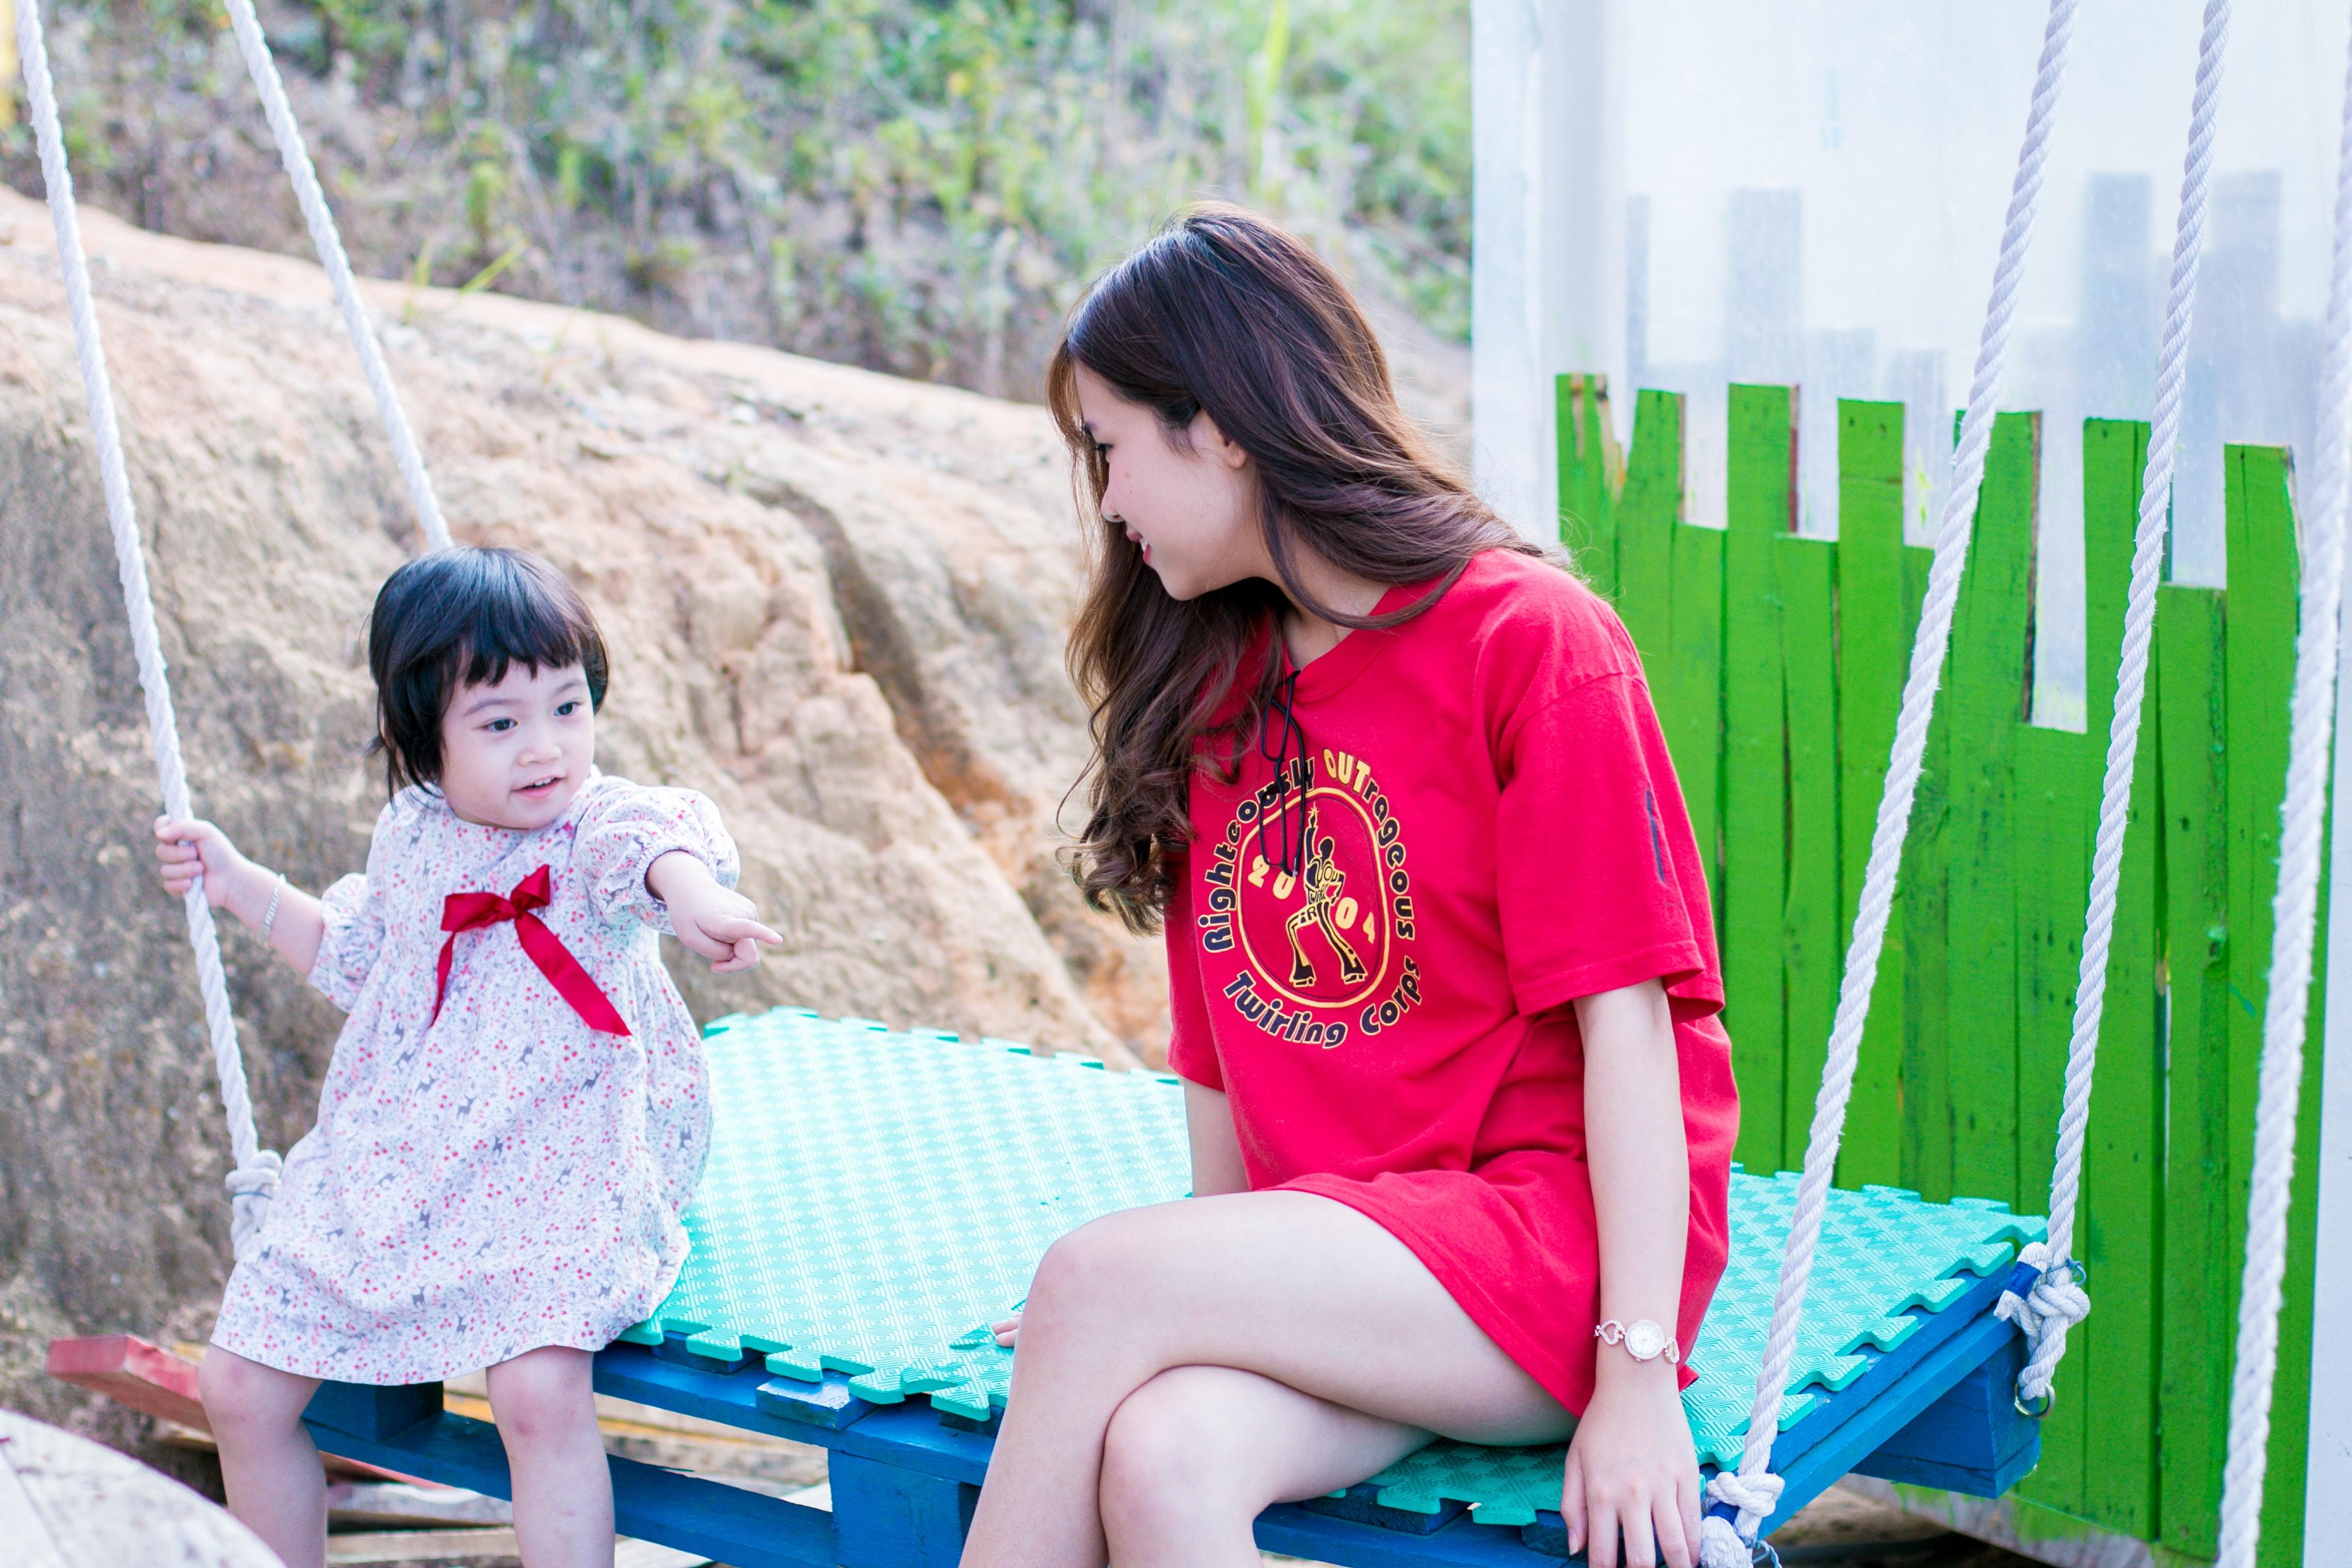 Woman Wearing Red Crew-neck Shirt Sitting on Swing Bench